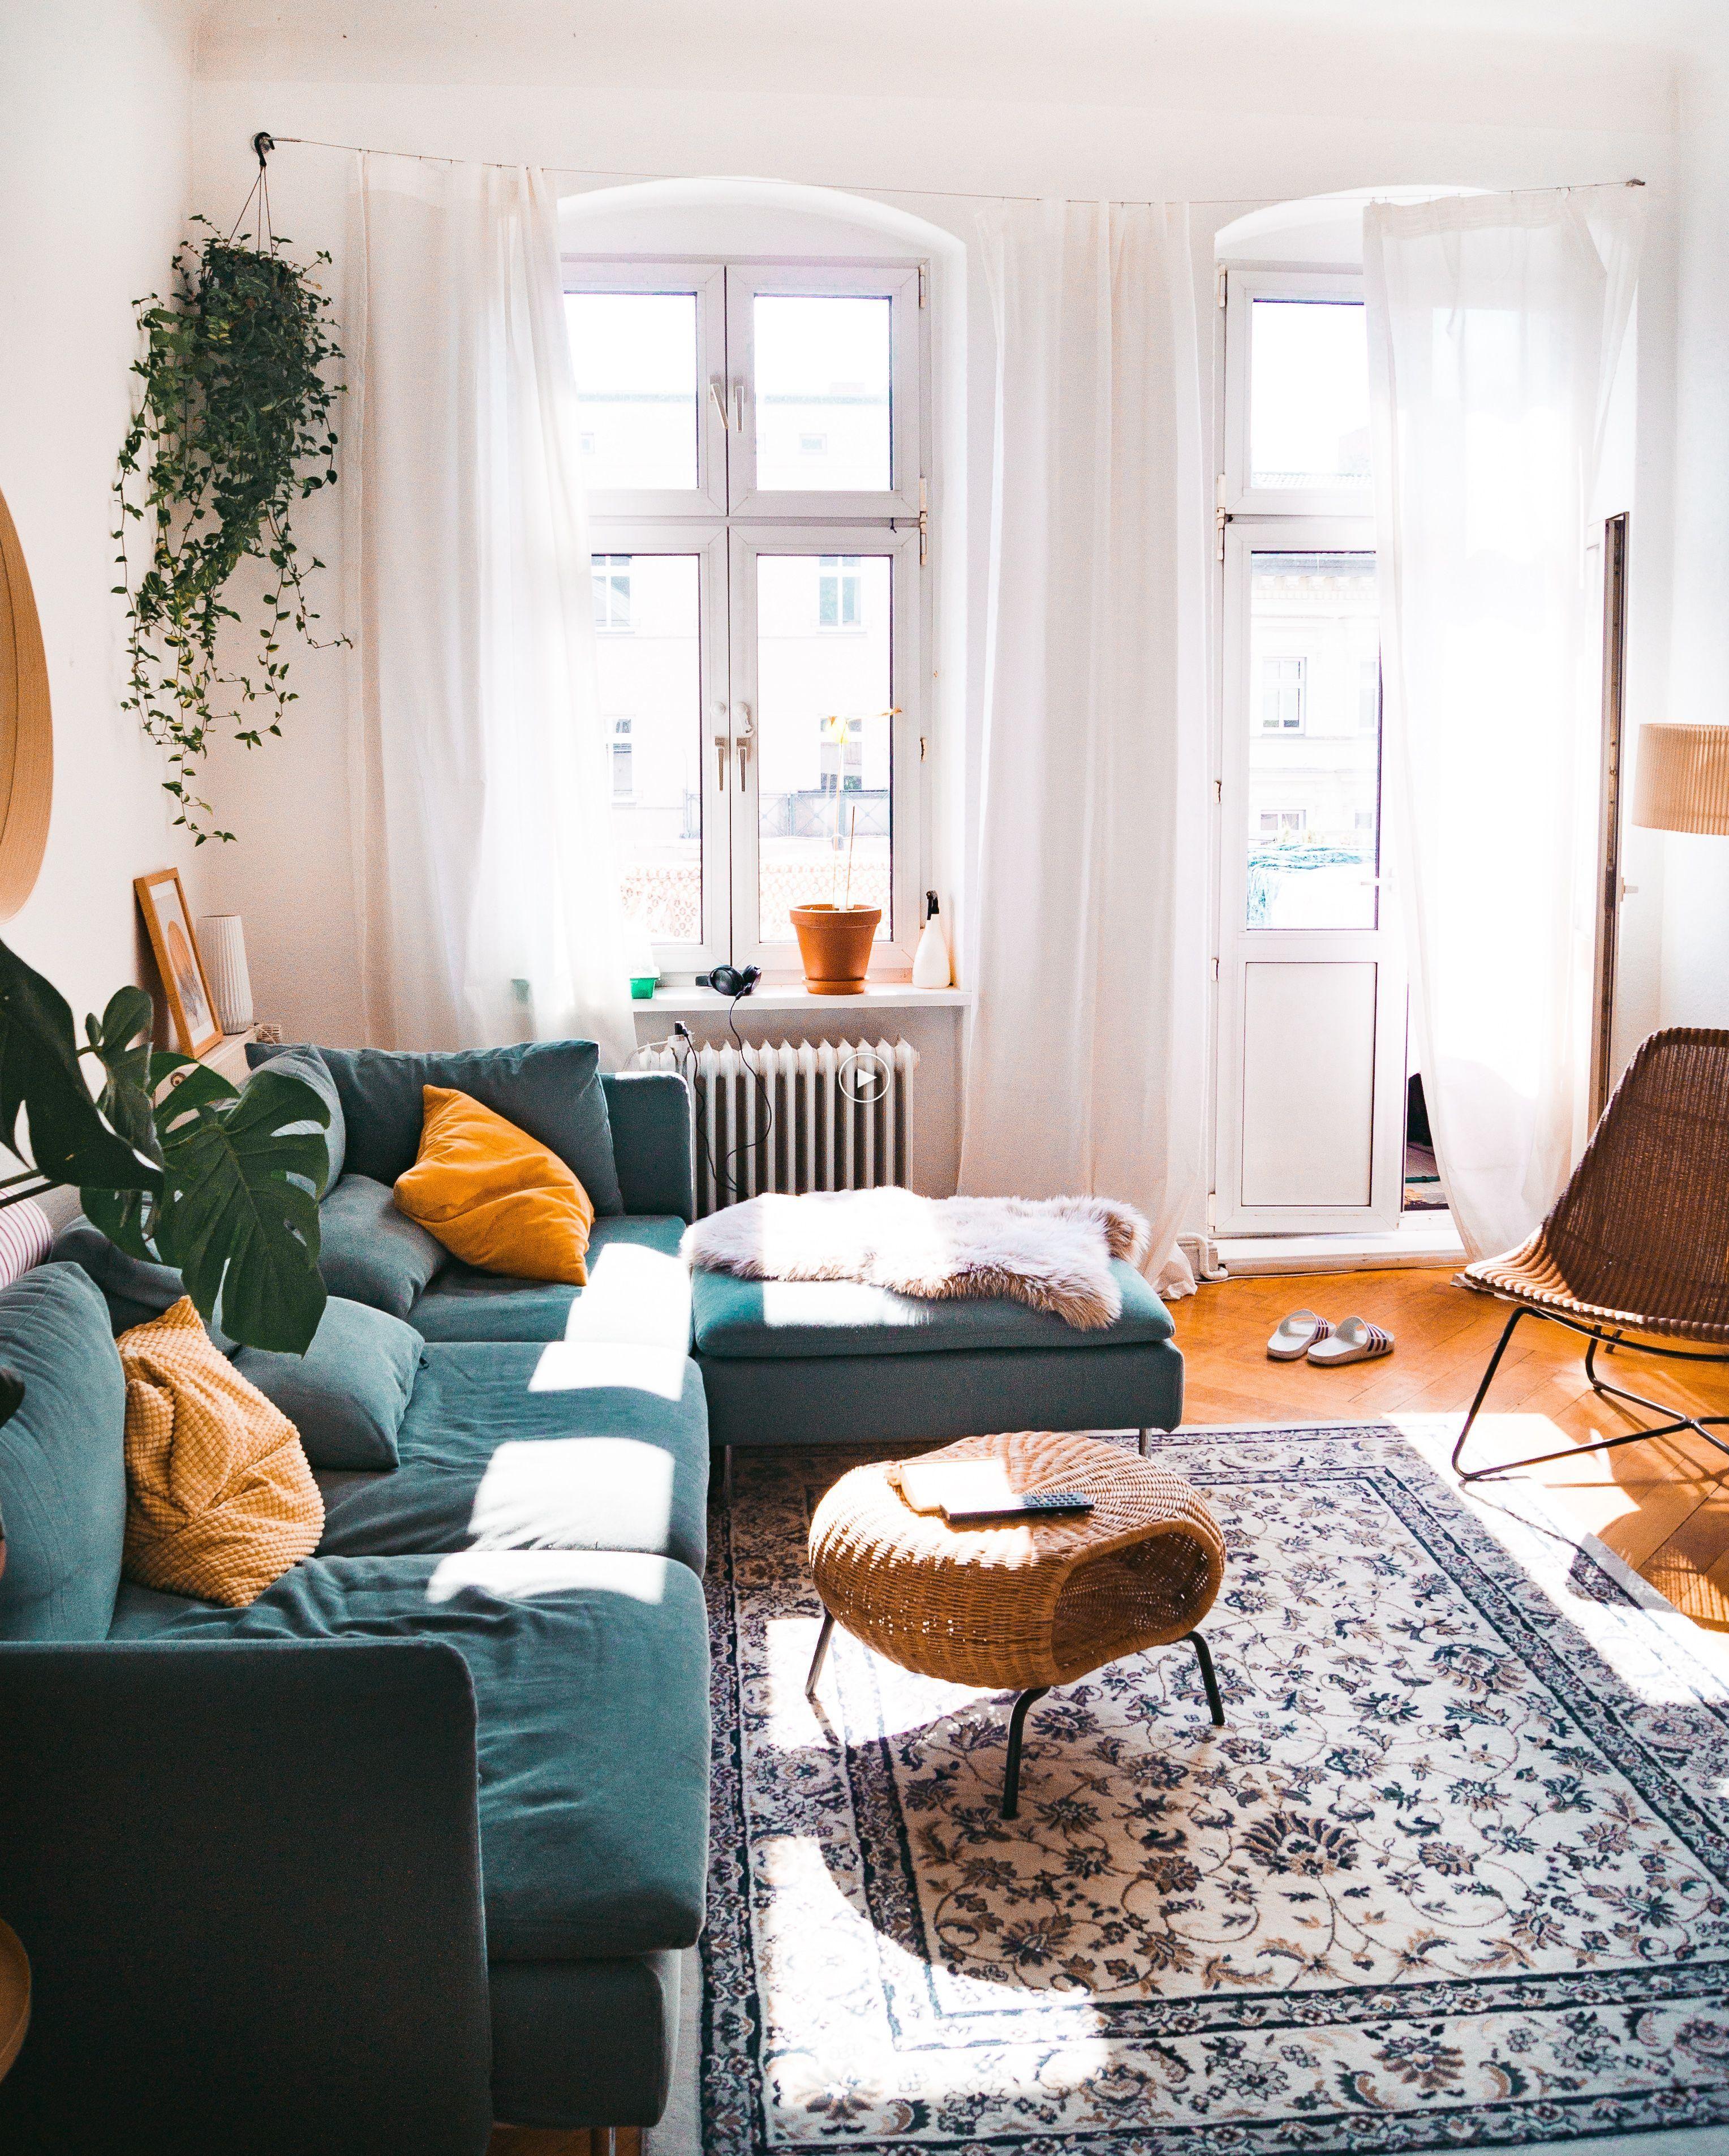 En Visite Chez Nous Fridlaa Salon Ideesdesalon Salondecoration